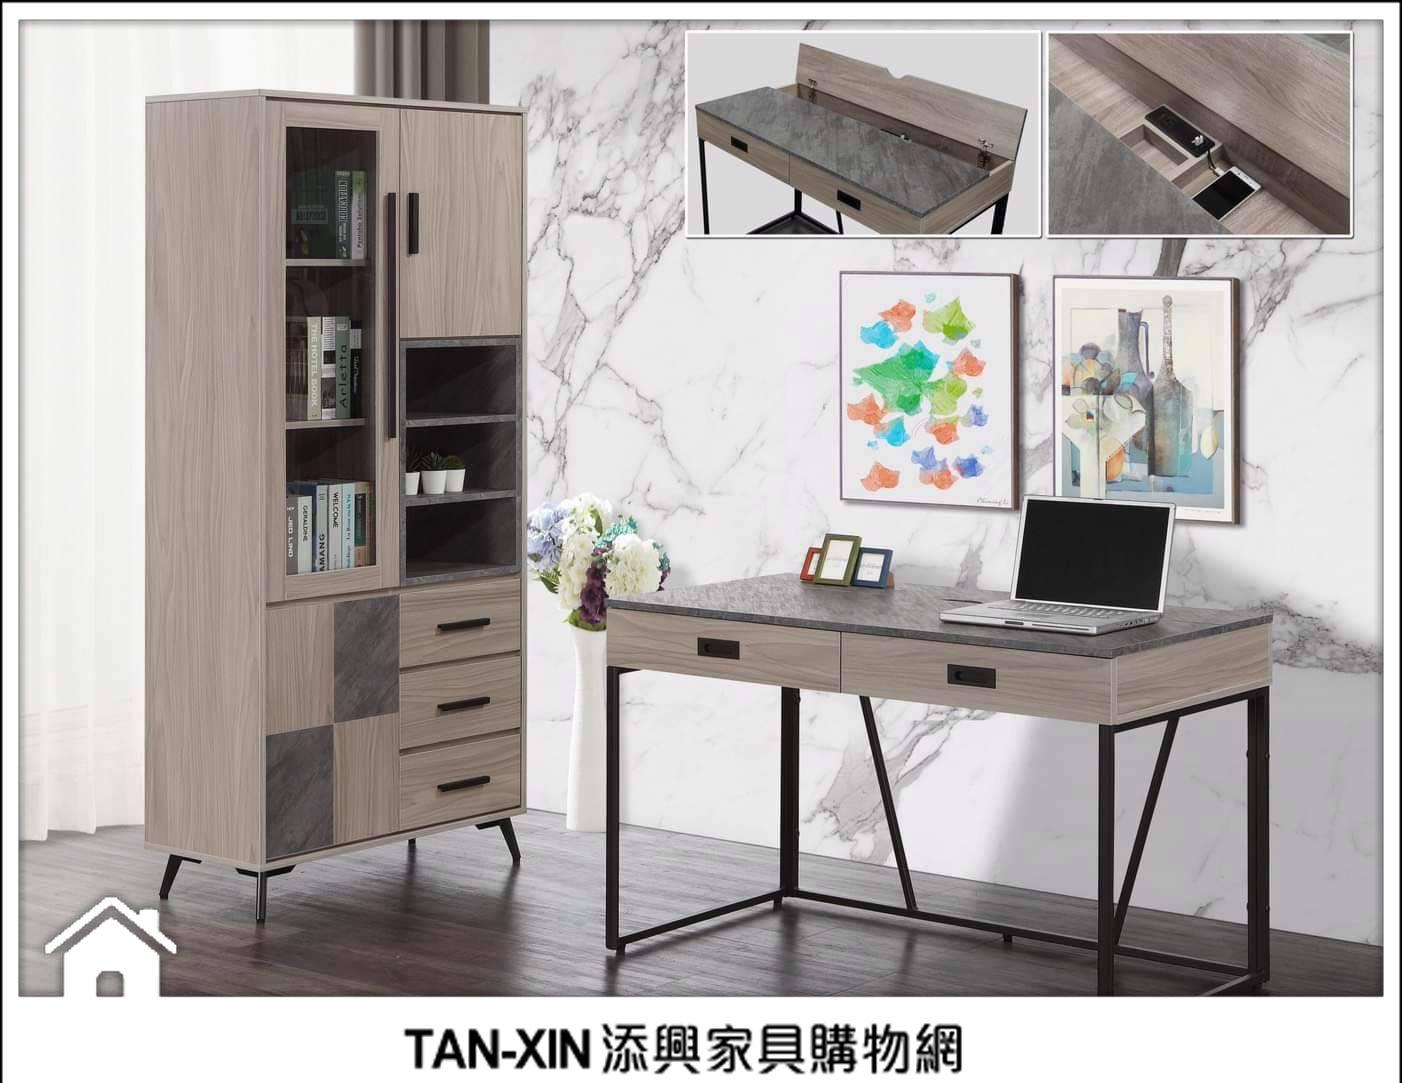 TS801-1【書桌】 蓋伊4尺工業風/清水模書桌 【添興家具】台北 台南實體店面